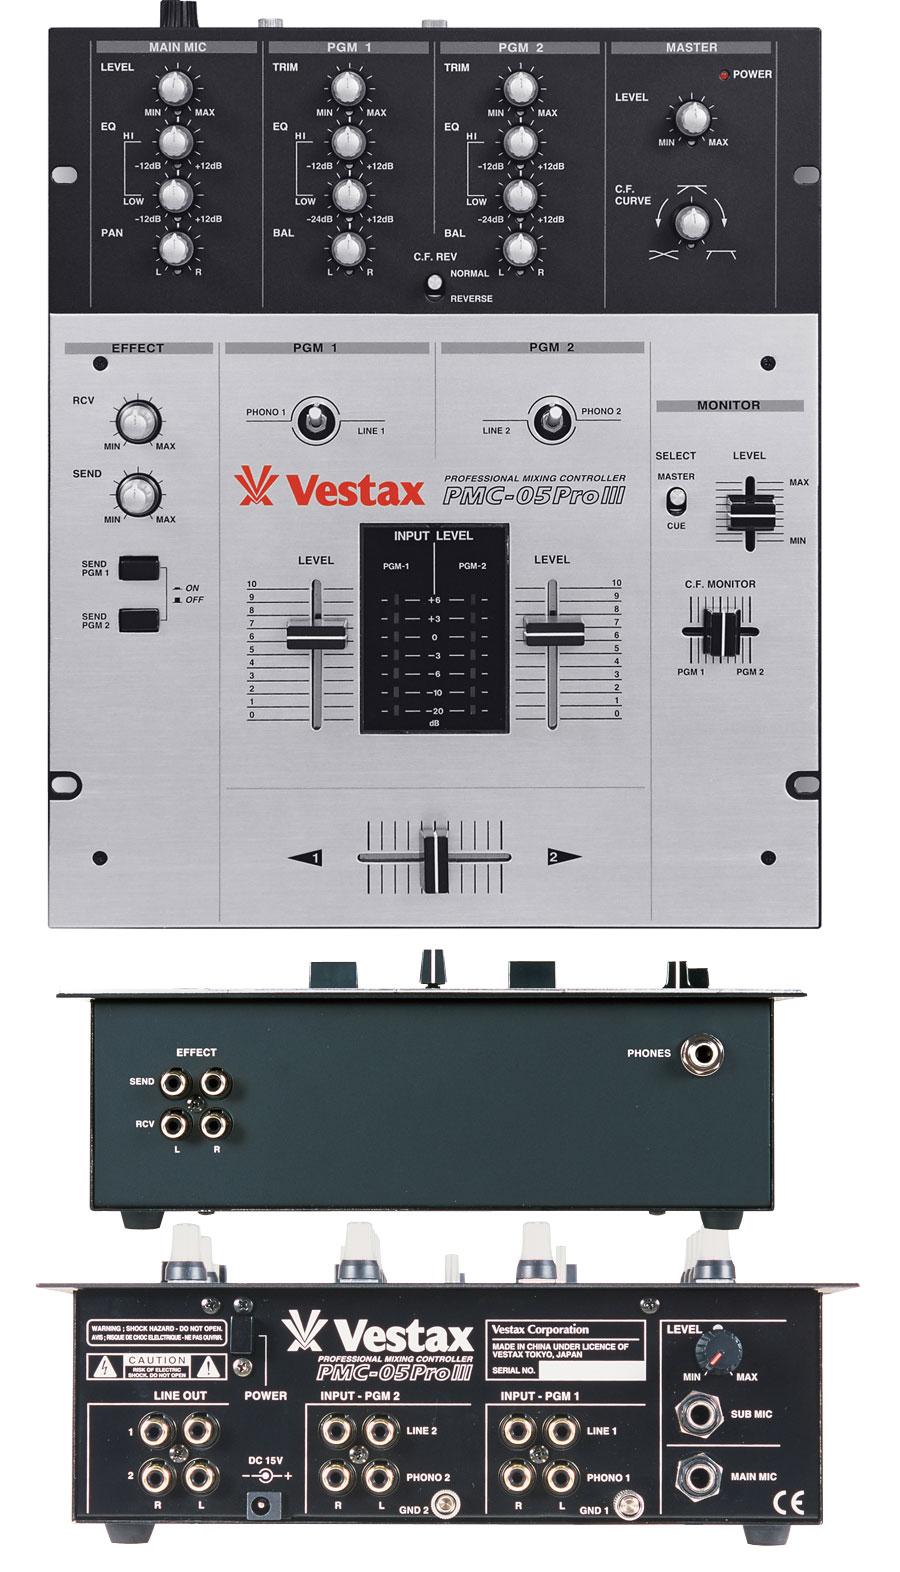 Vestax Pmc-05proiii Vca Vestax Pmc-05proiii Vca